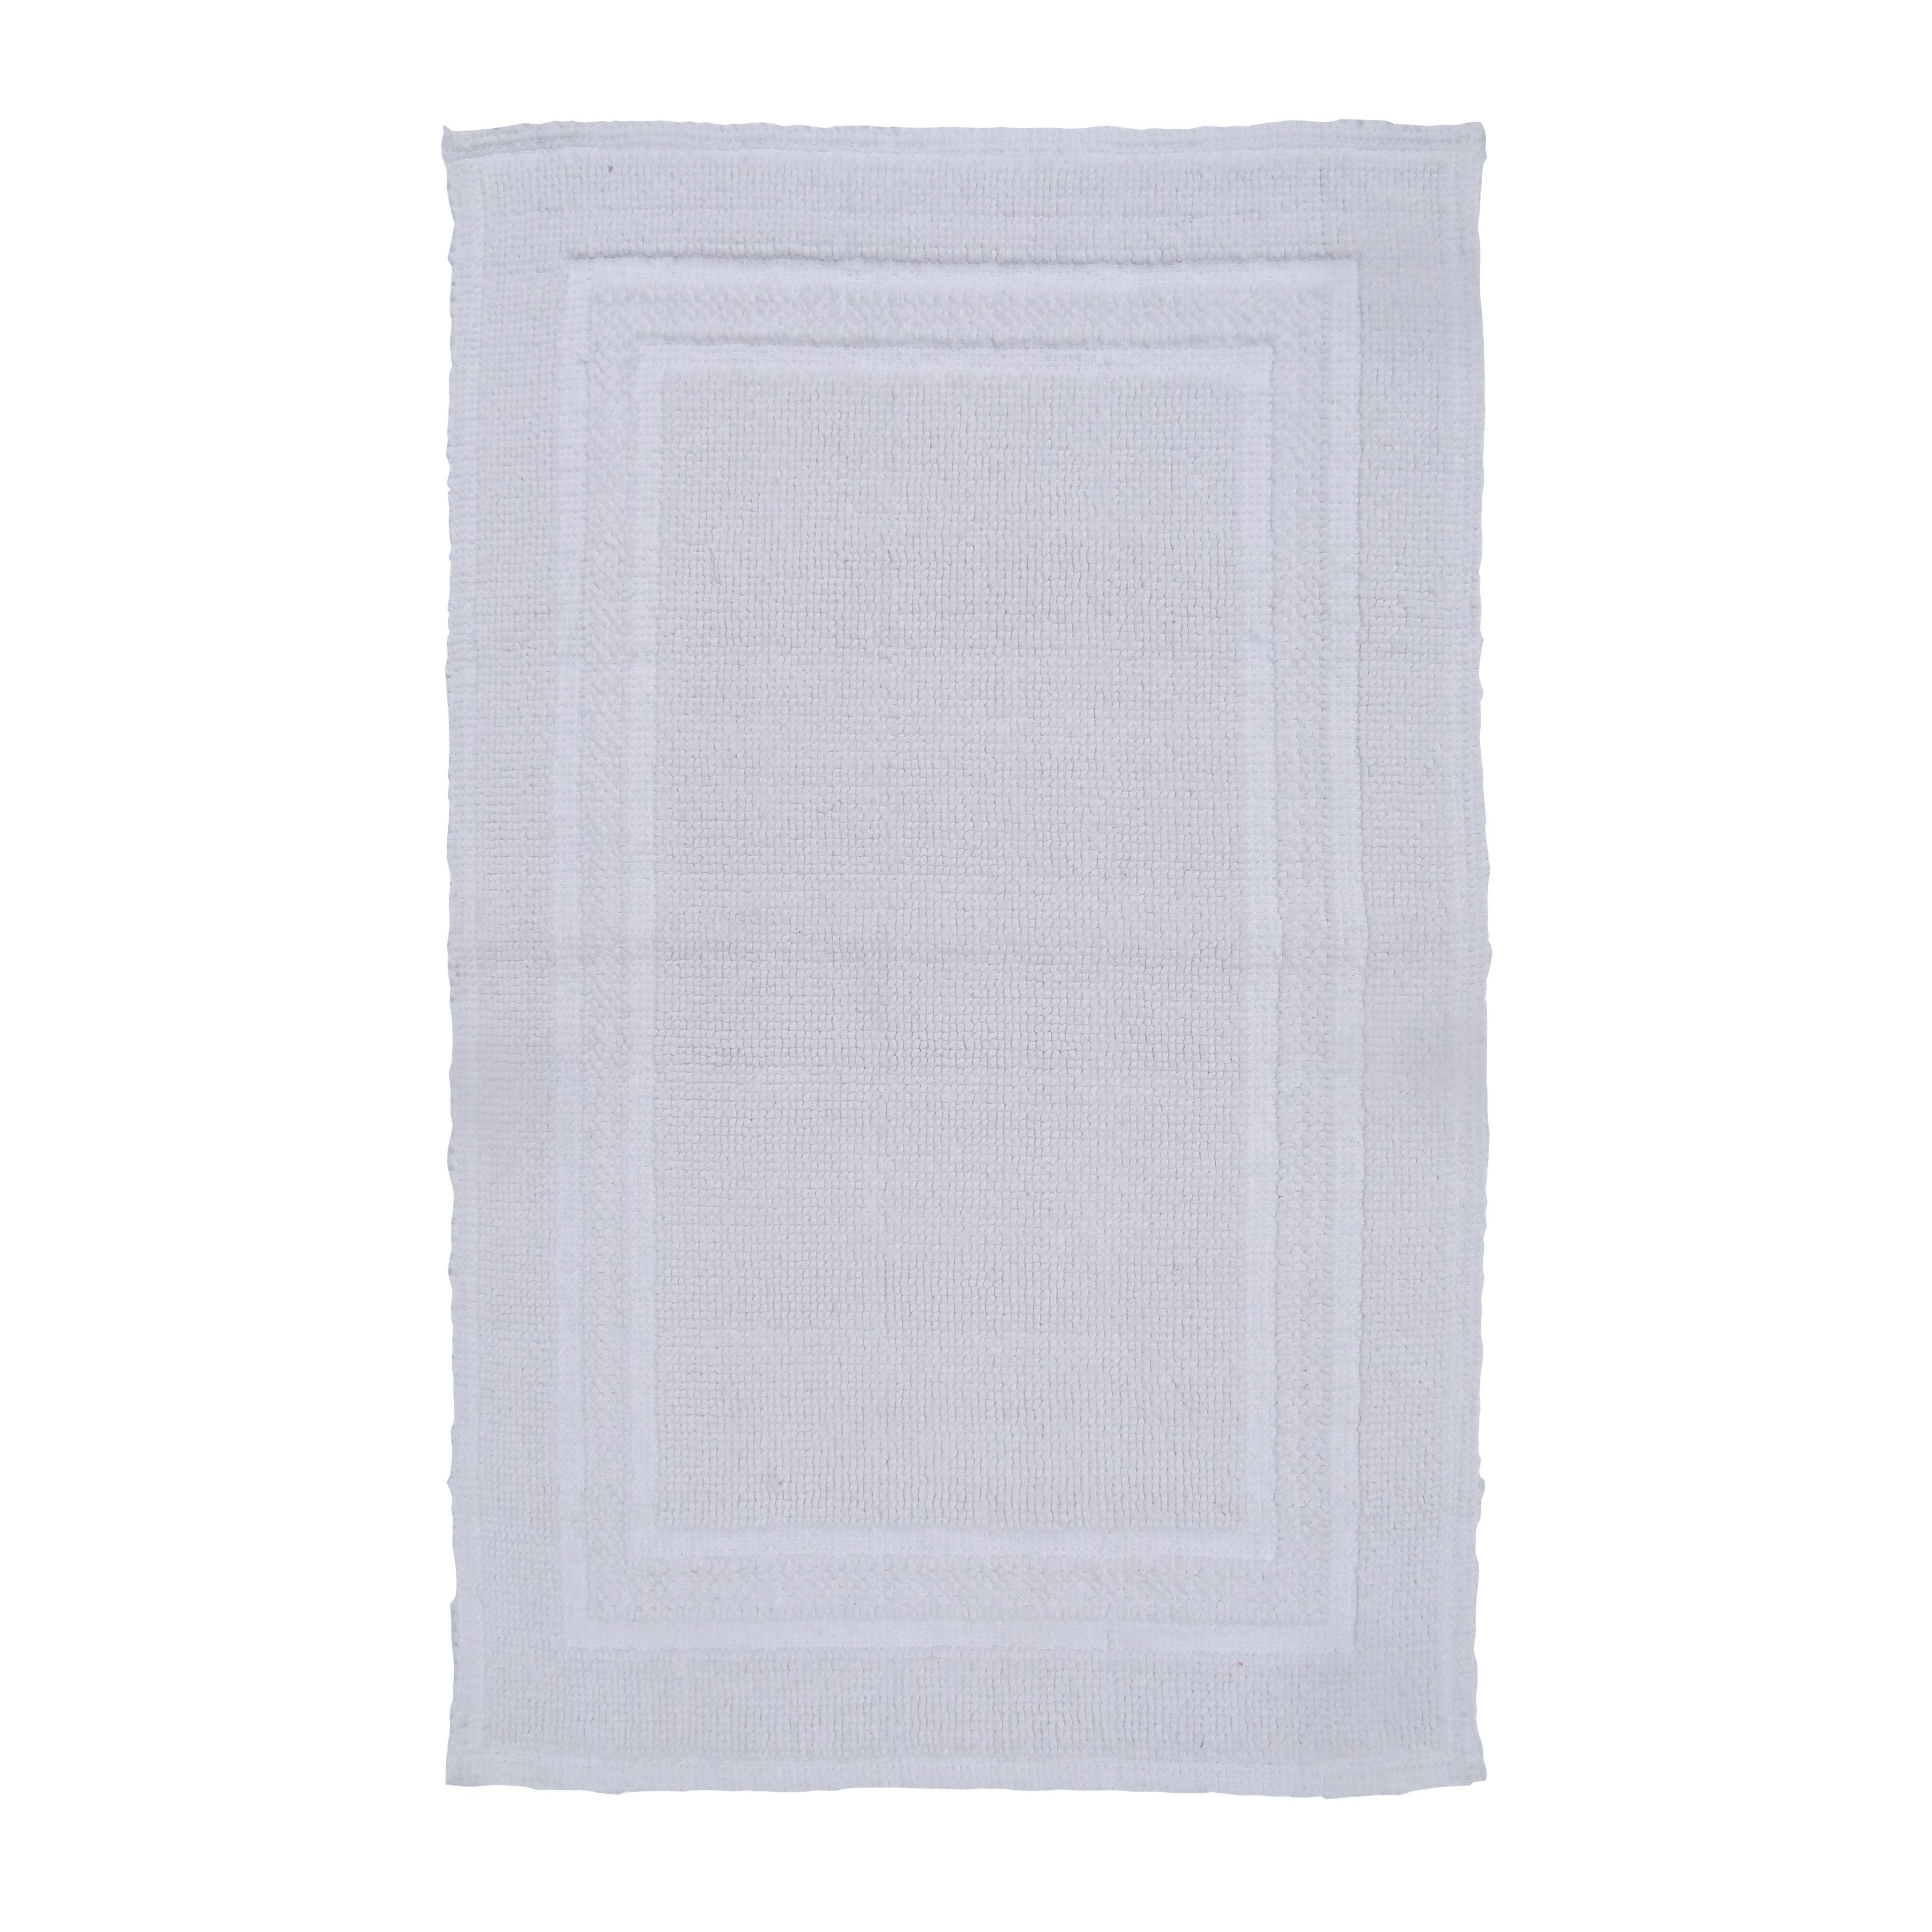 Sofia White Cotton Anti-slip Backing Bath Mat (l)800mm (w)500mm